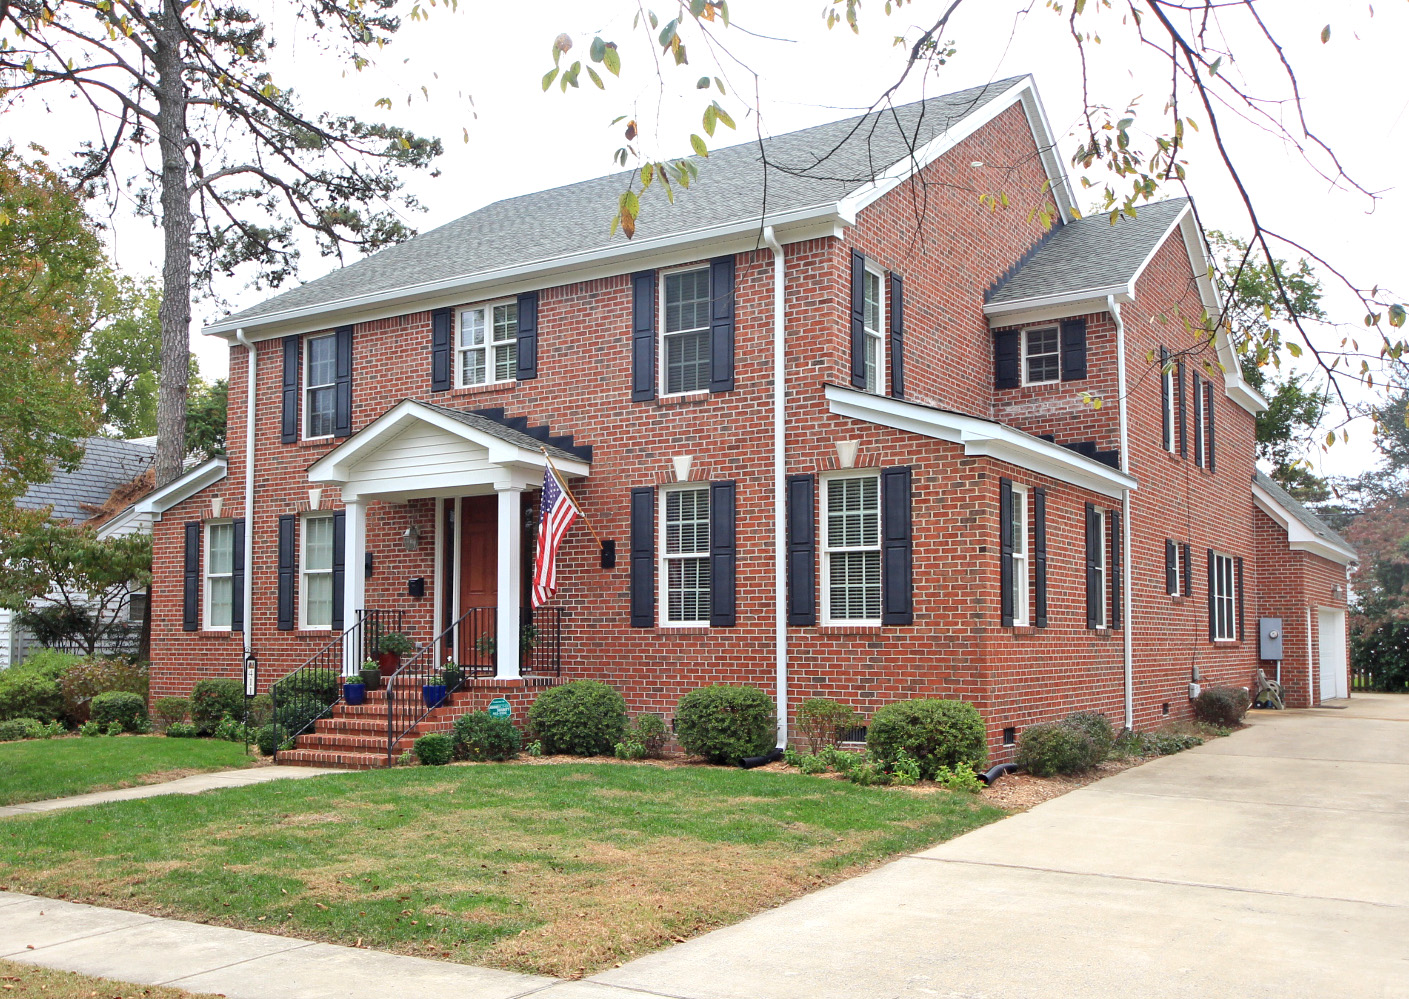 411 Oak Grove Road: Sold!